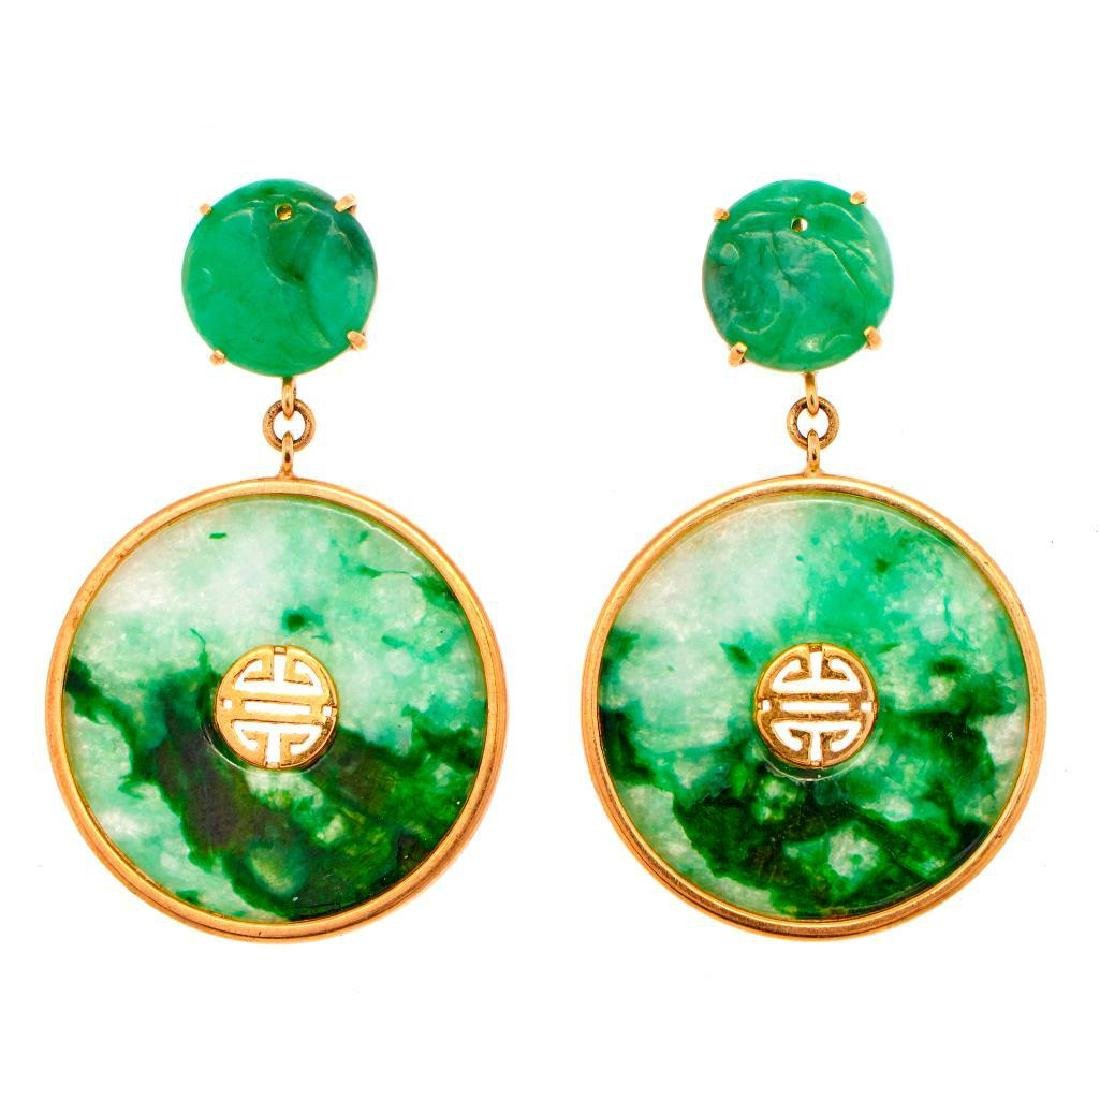 Pair of jade and 14k gold earrings